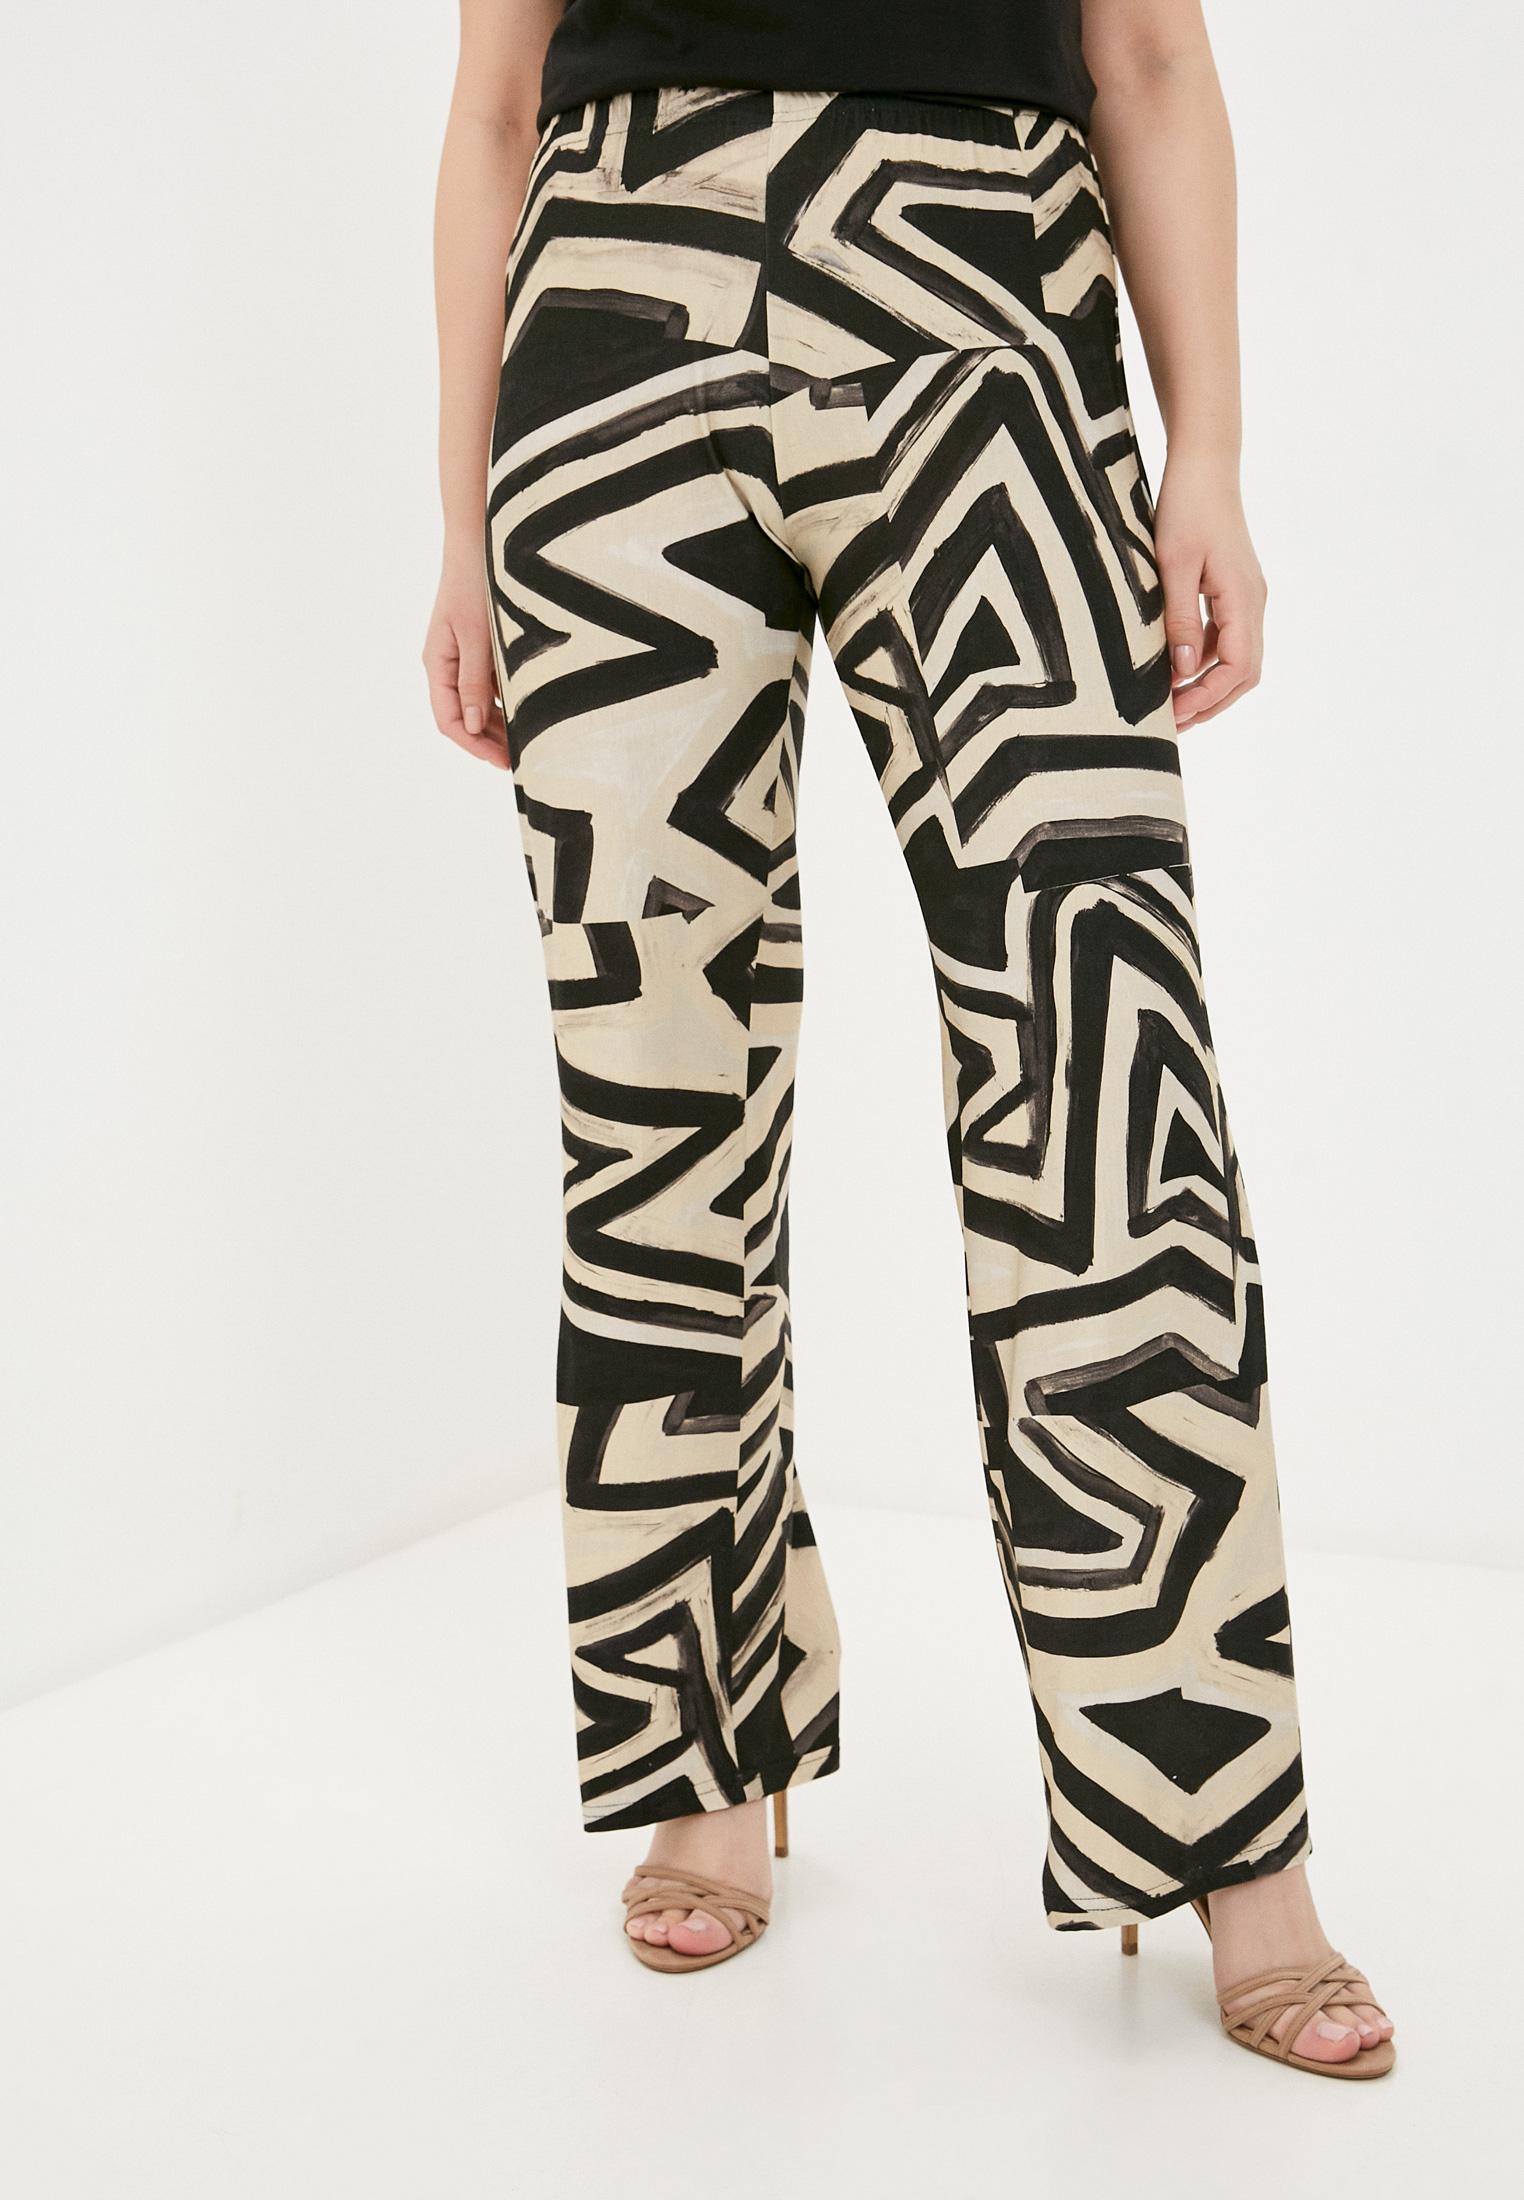 Женские прямые брюки Sophia Брюки Sophia